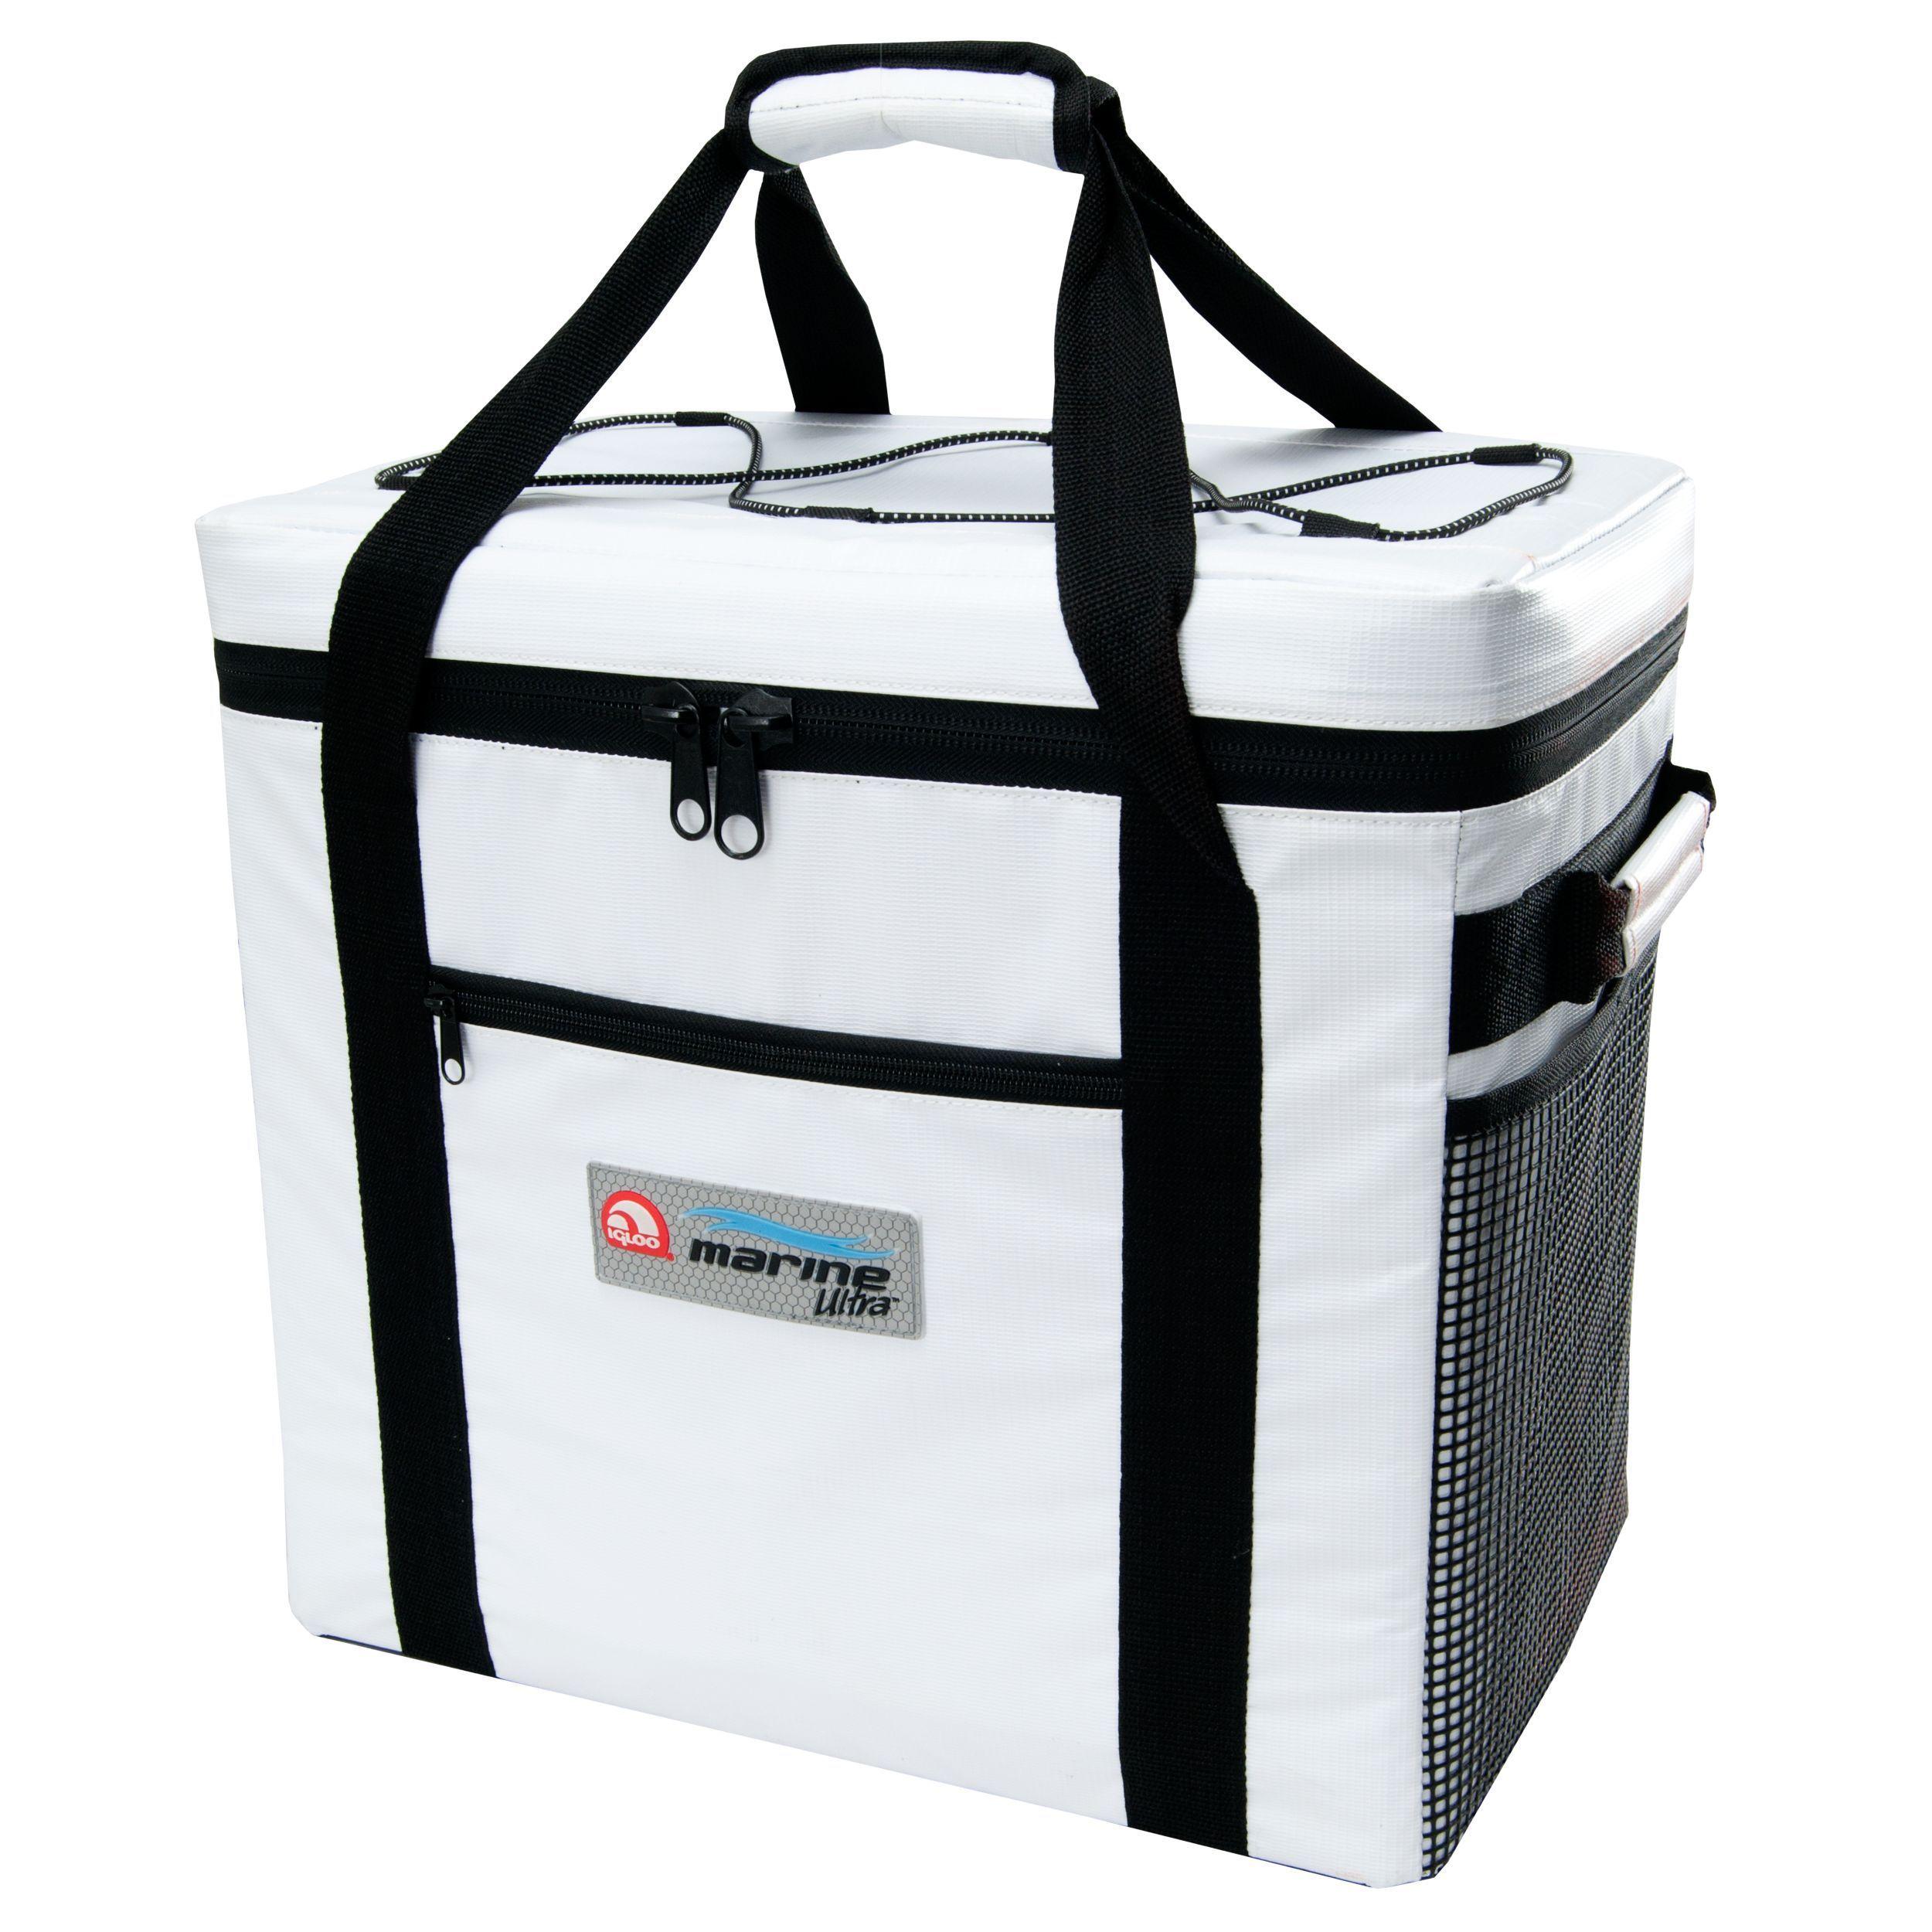 Igloo 57178 Marine Ultra 36 Can Square Cooler Bag (White)...